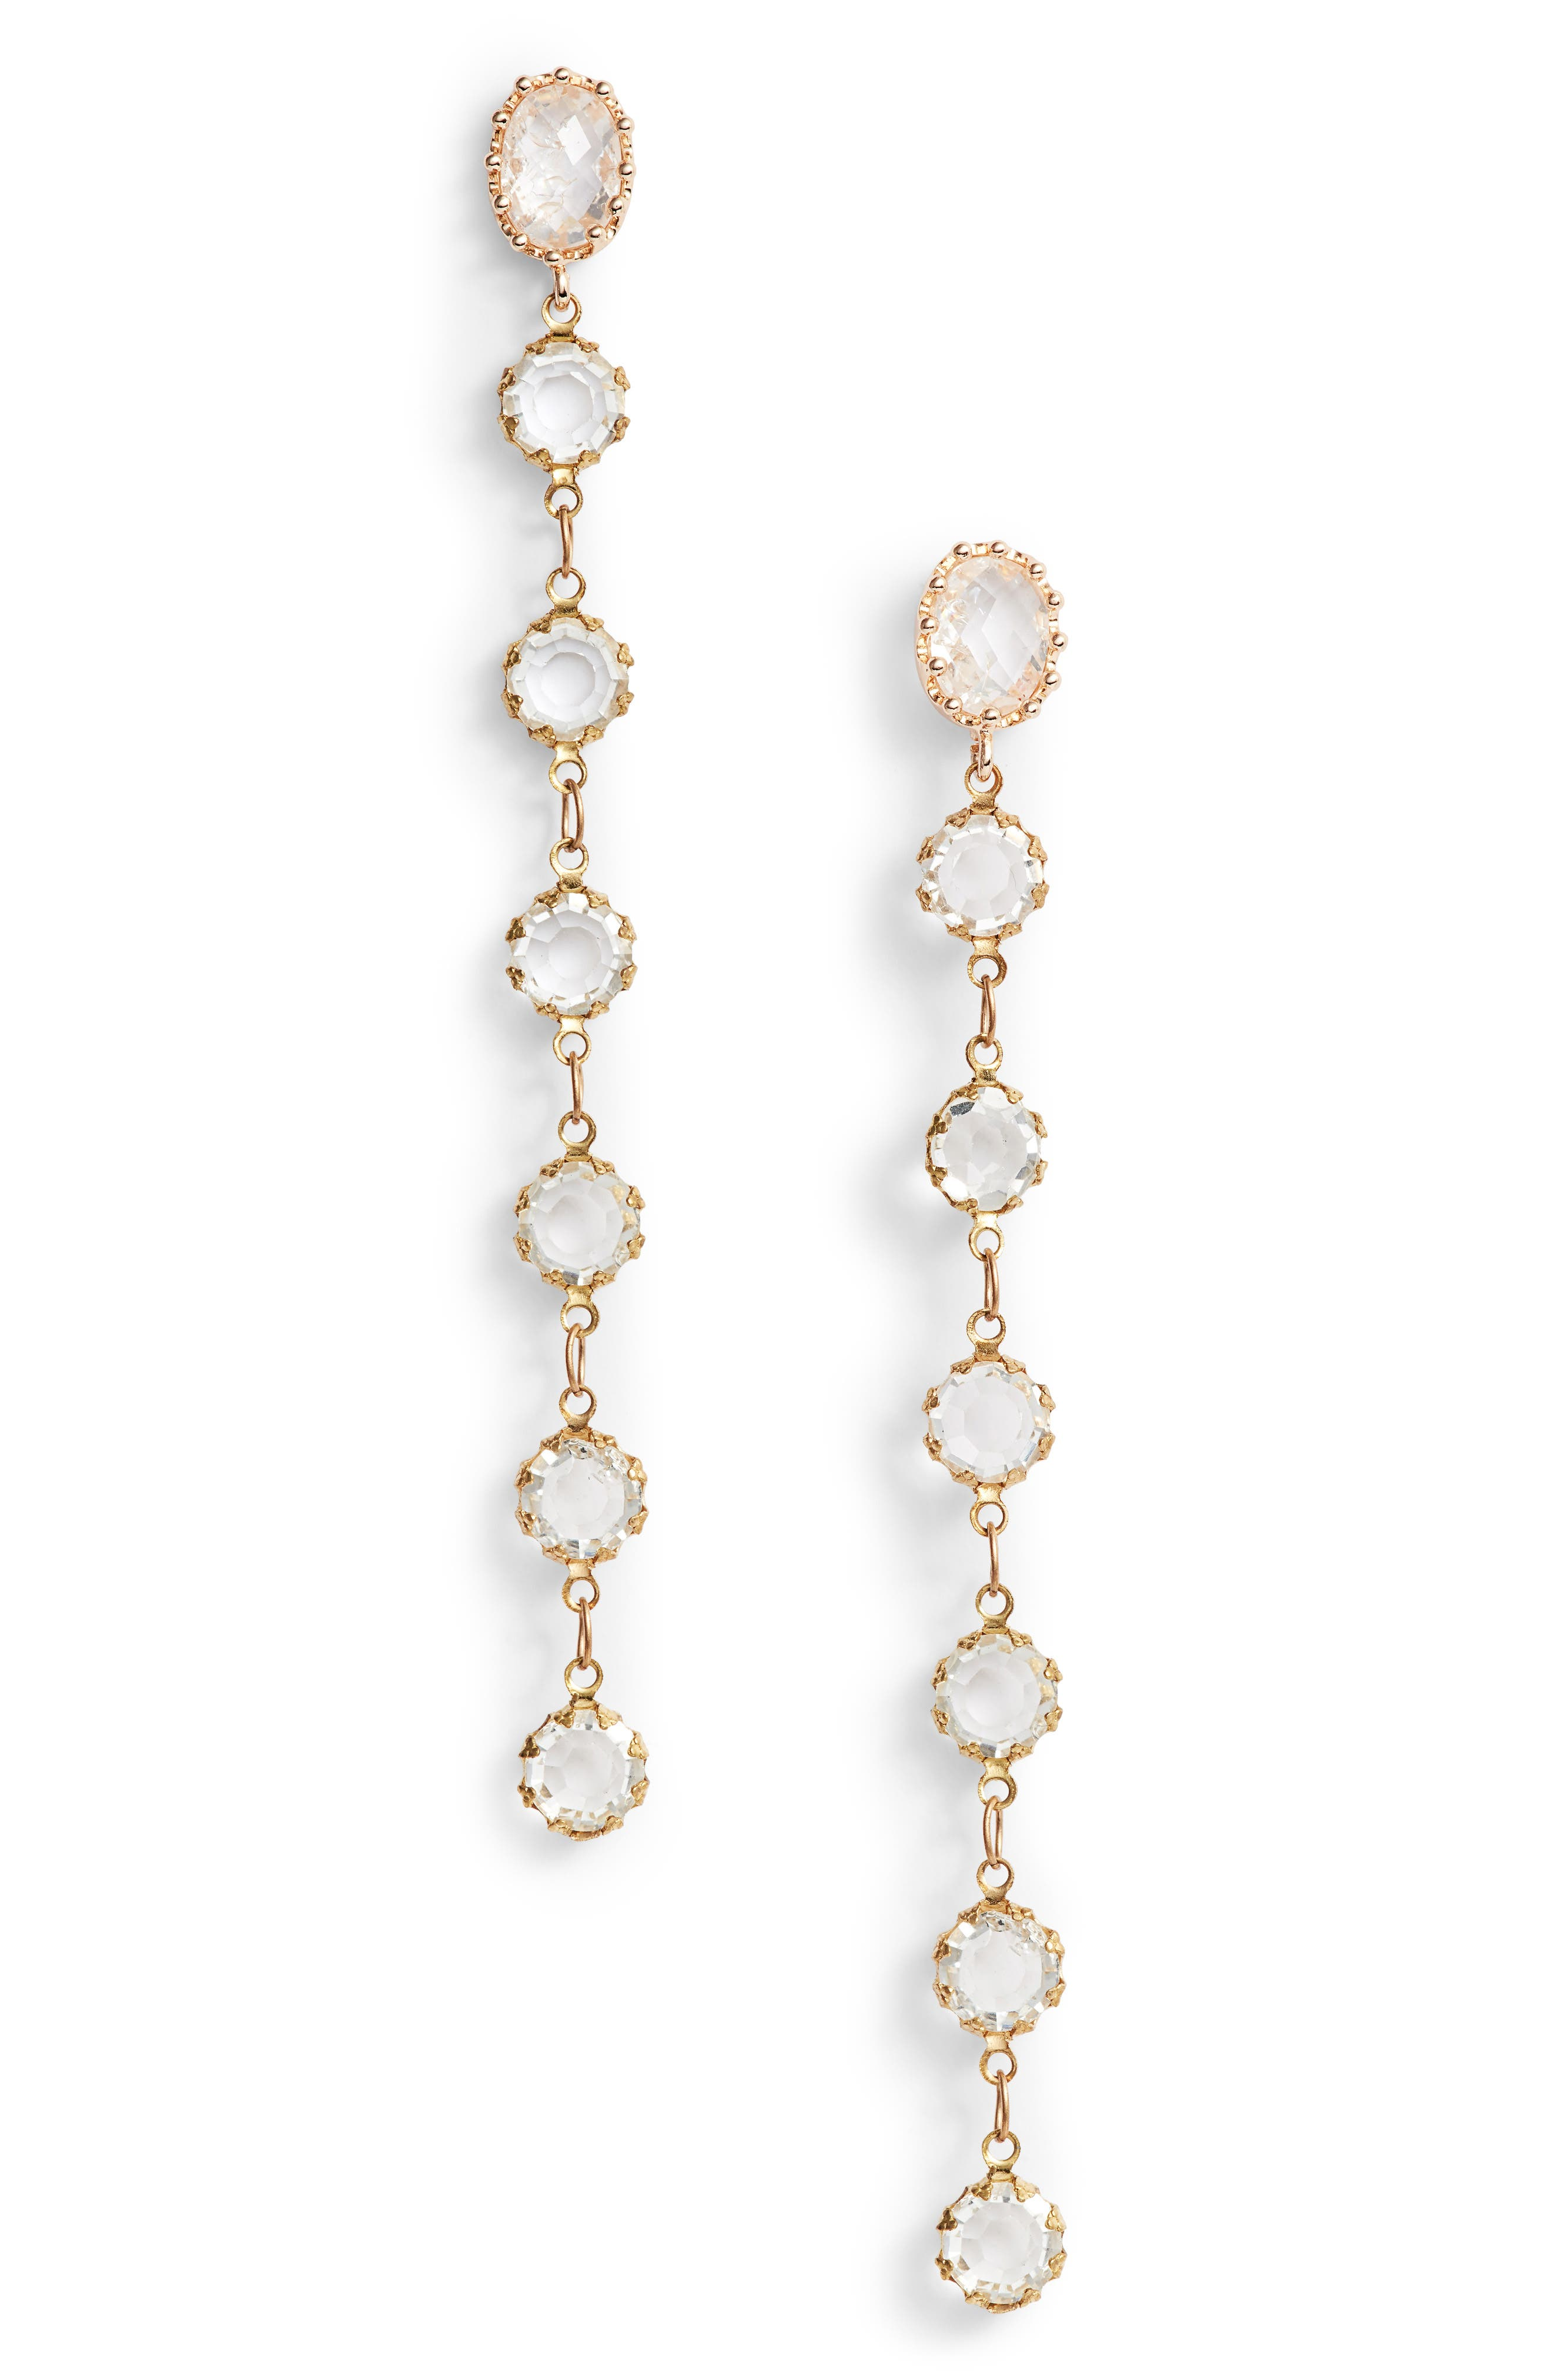 Linear Drop Earrings,                             Main thumbnail 1, color,                             Gold/ Clear